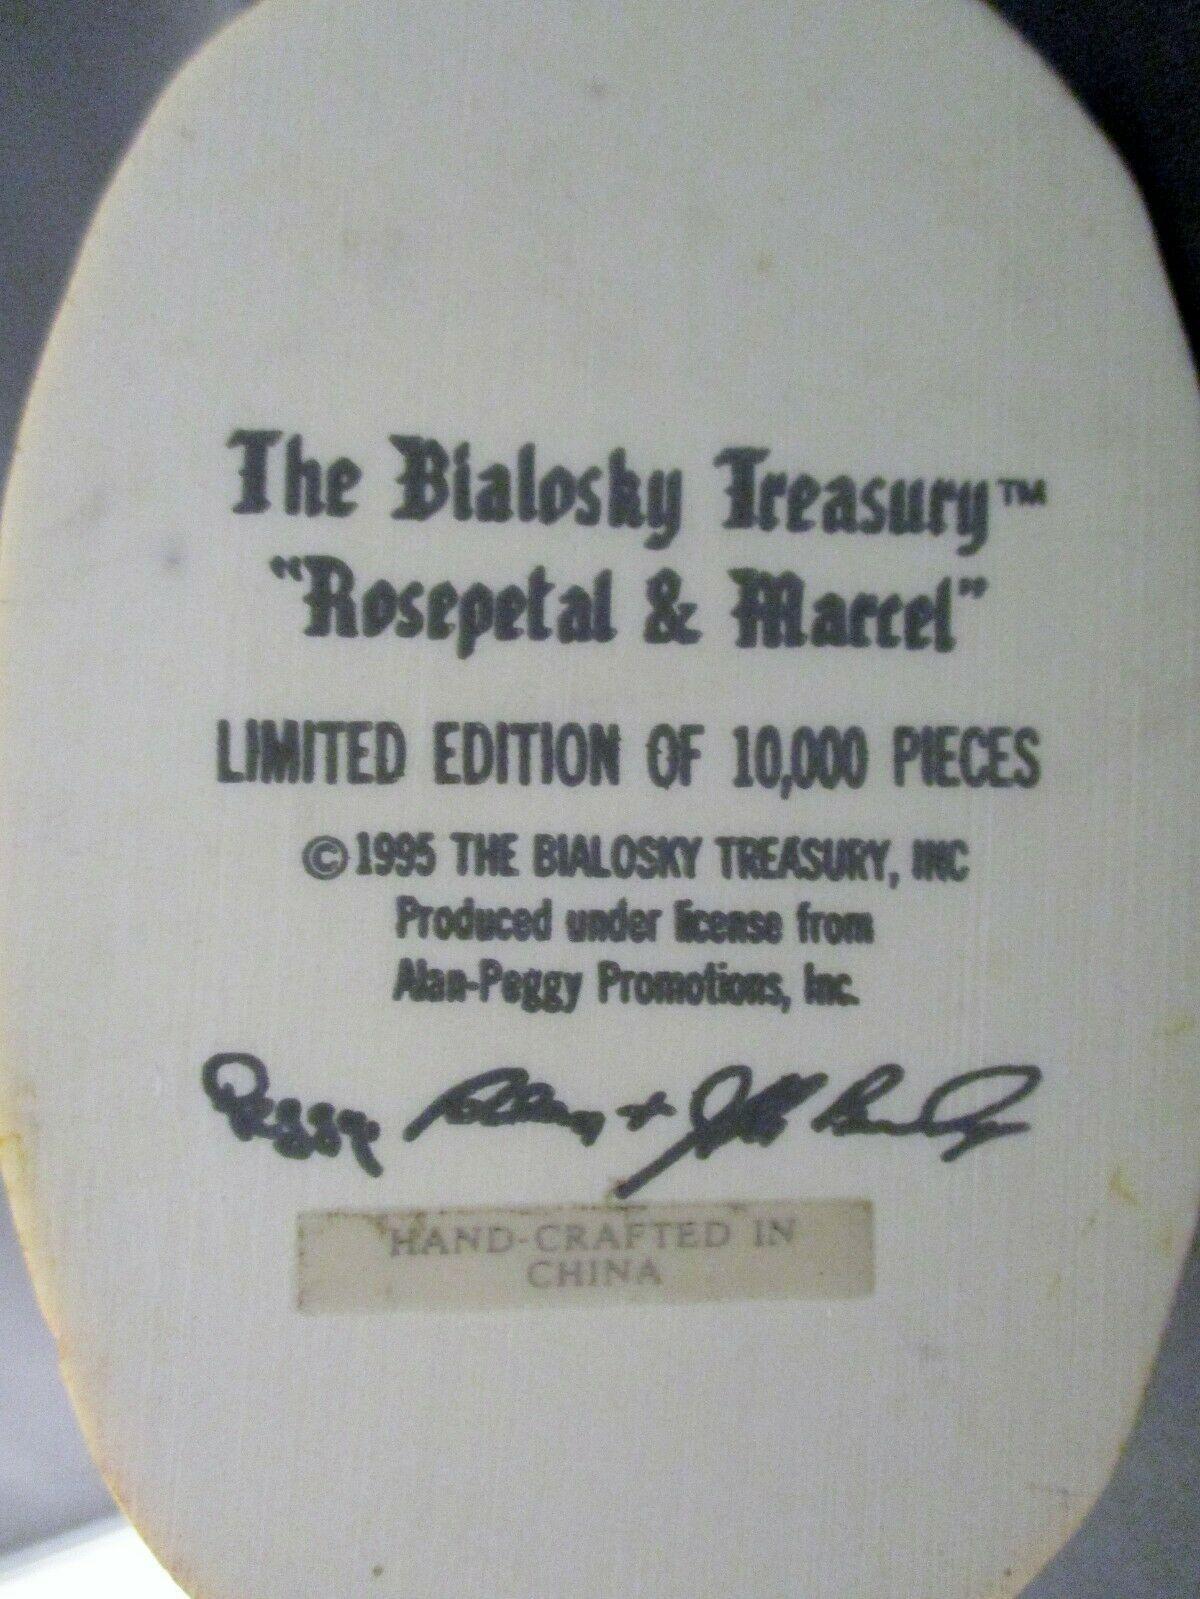 "The Bialosky Treasury ""Rosepetal and Marcel"" Figurine 1995 image 8"